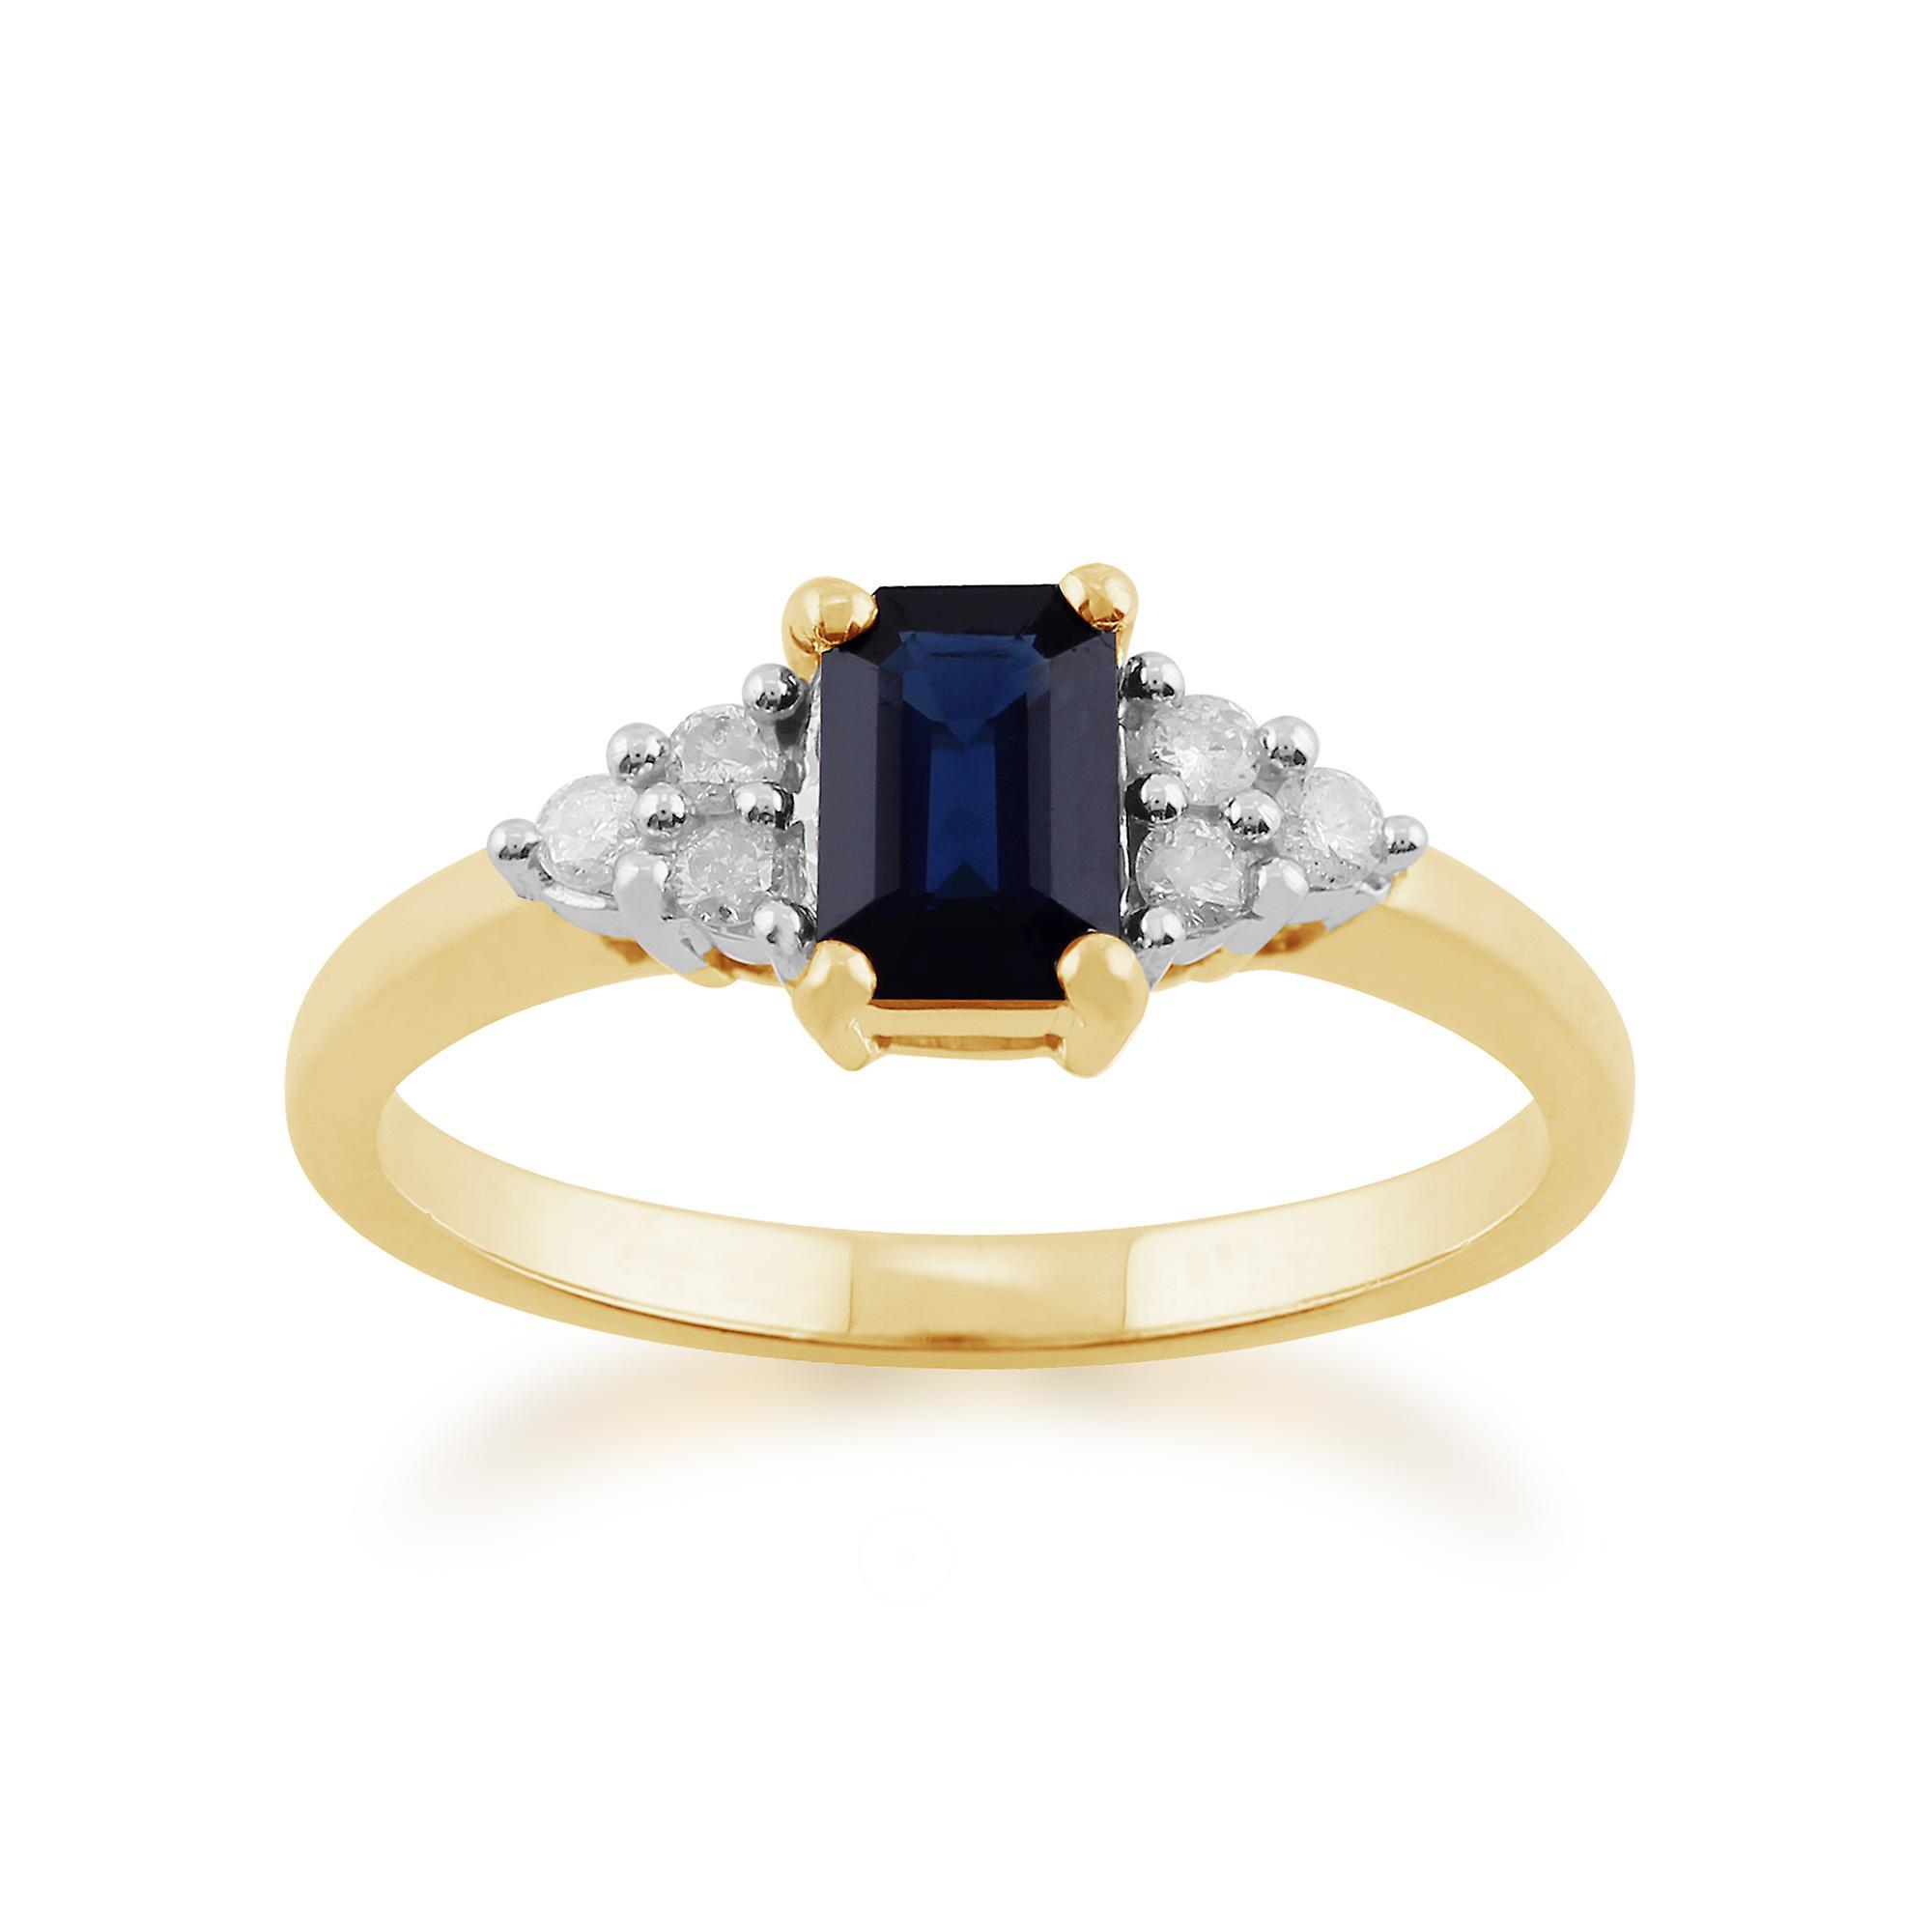 Gemondo 9ct Yellow Gold 0.88ct Octagon Blue Sapphire & Diamond Ring